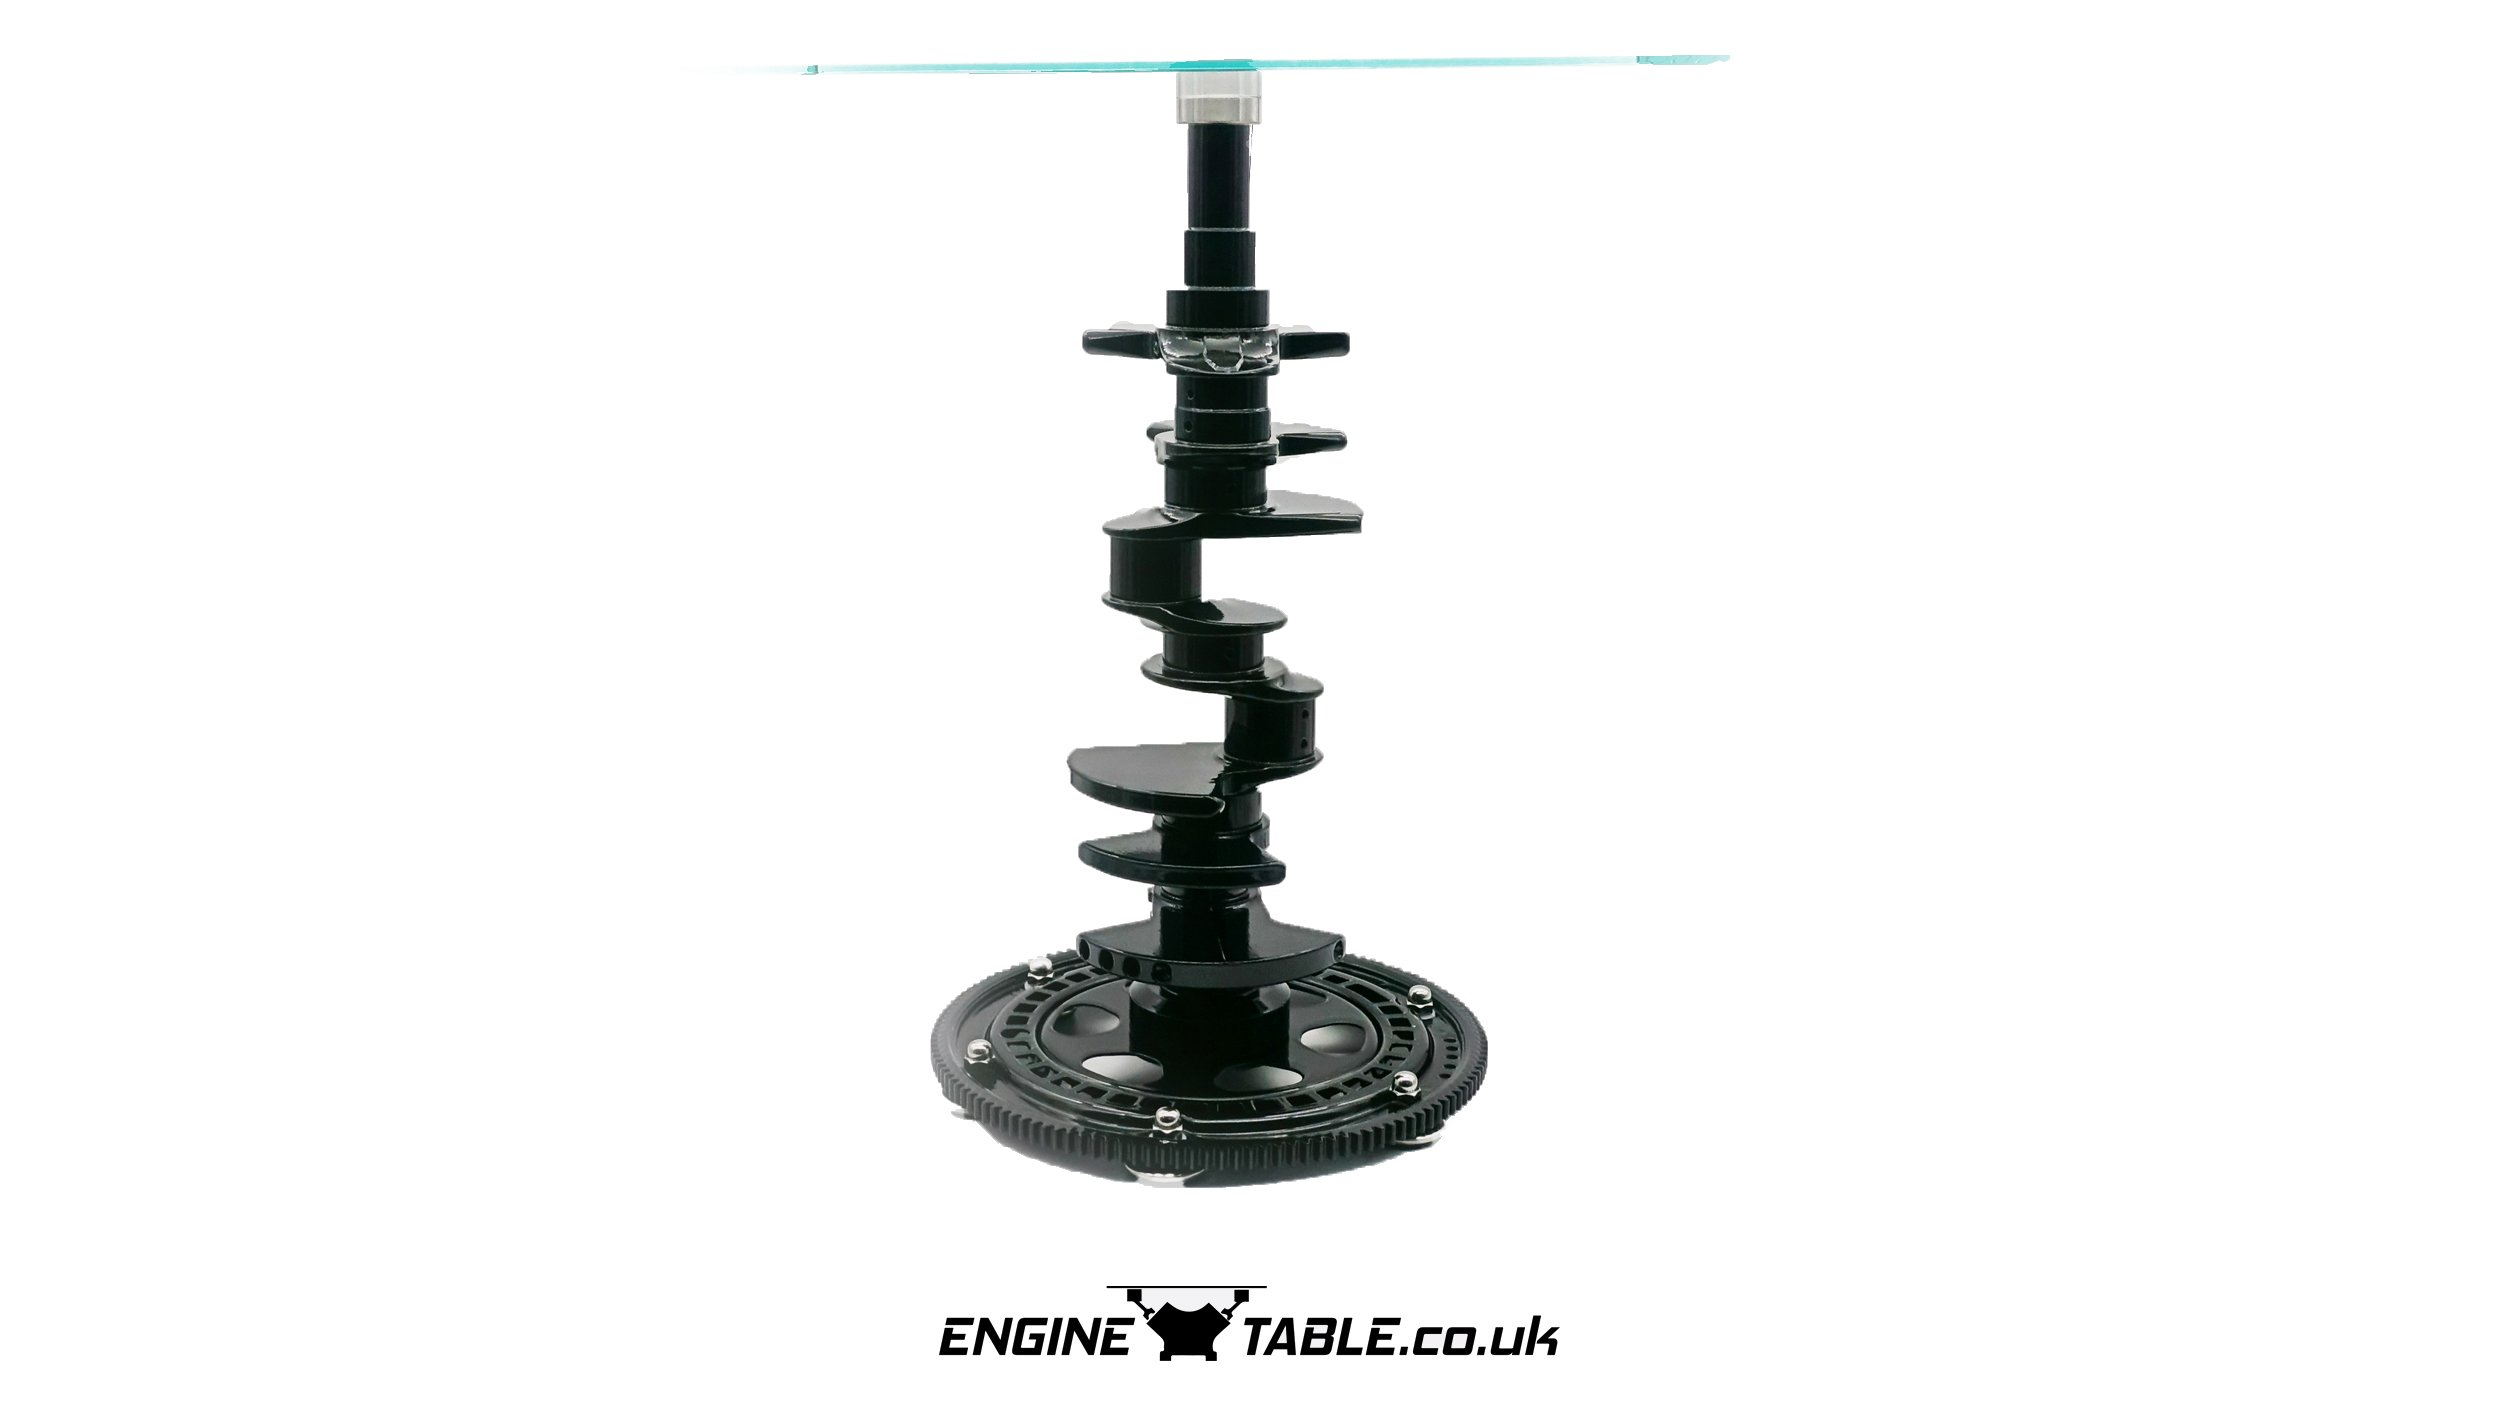 Crankshaft Side Table By Engine Table Uk